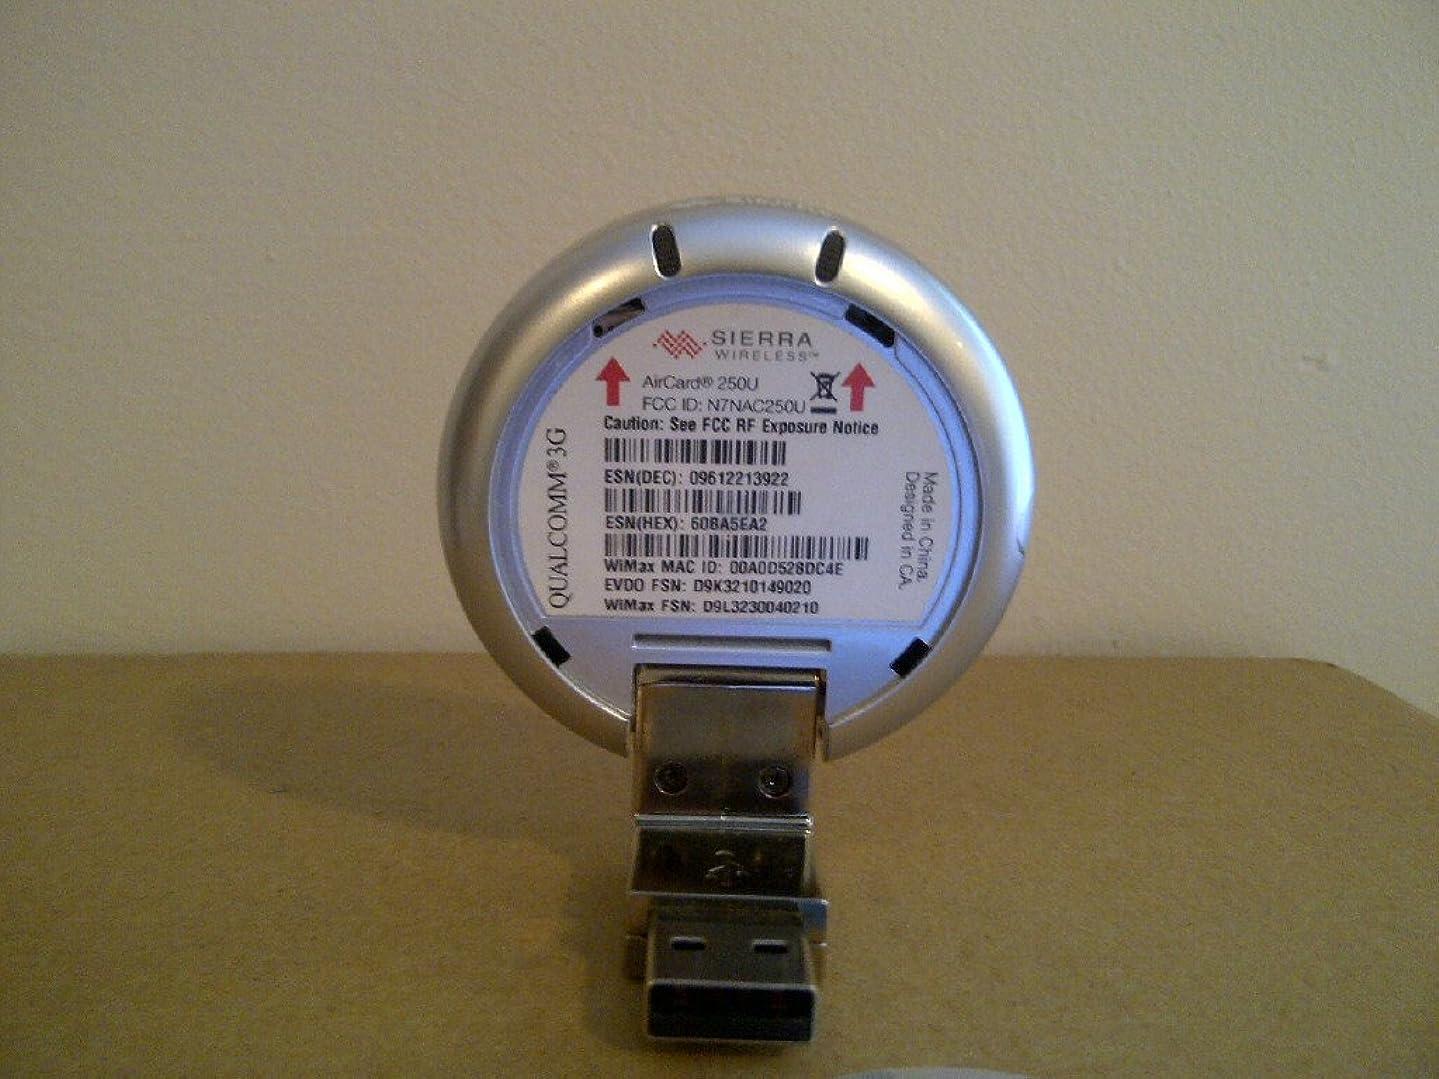 Sierra Wireless 4G Aircard 250U4G Wireless Modem Silver - Sprint